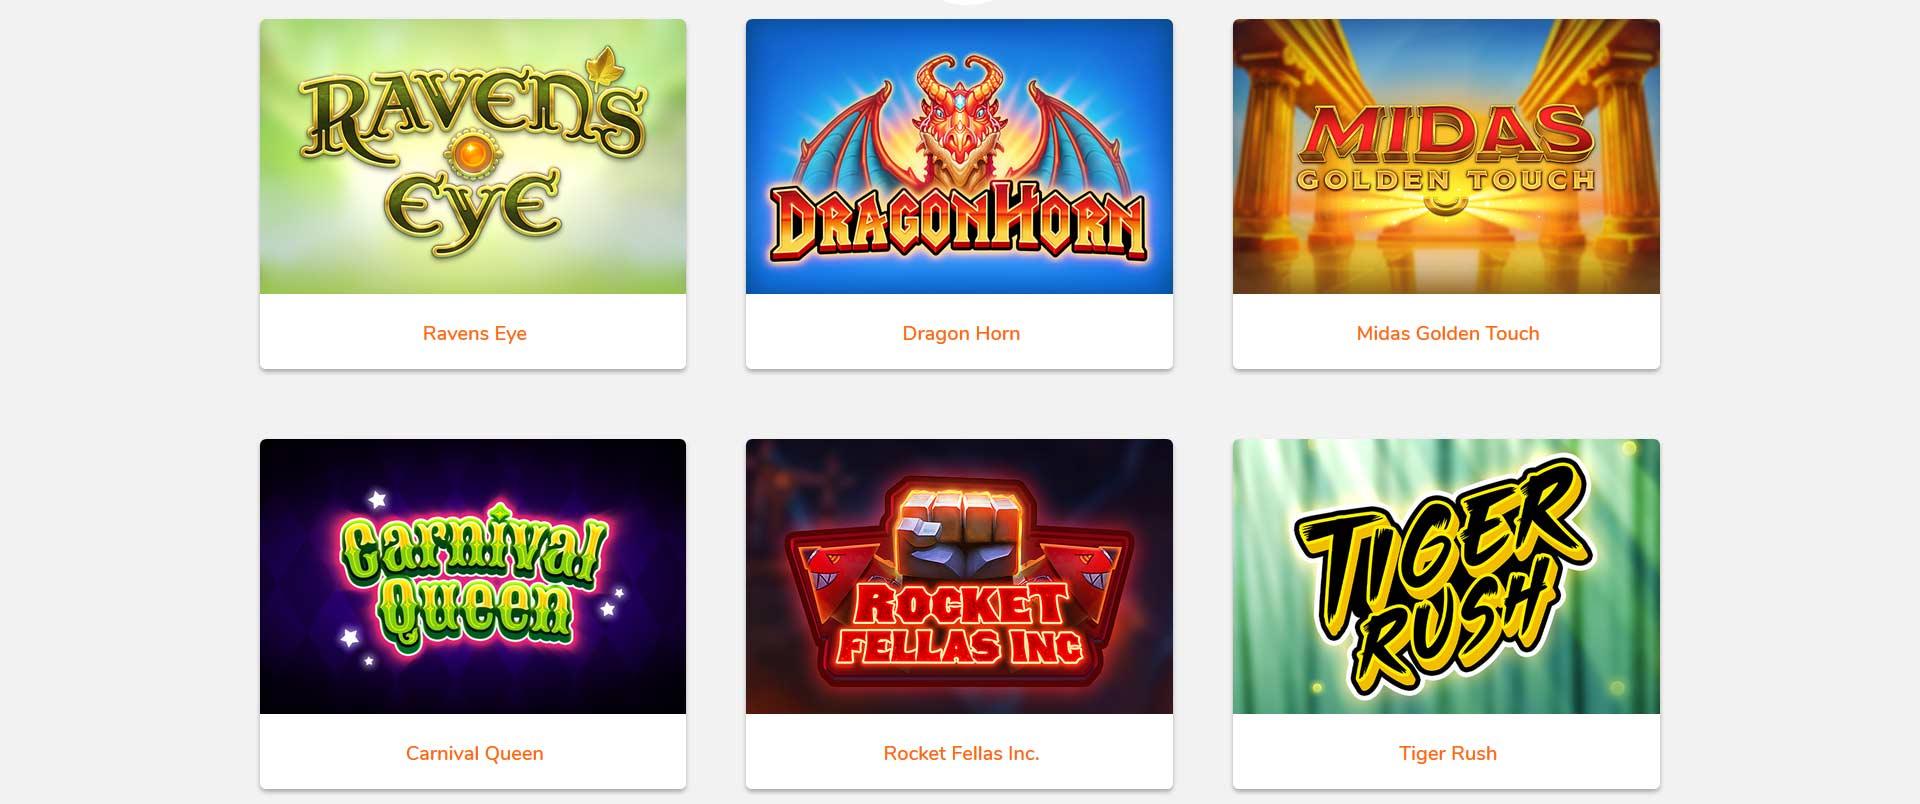 Thunderkick Bingo Software Screen Shot